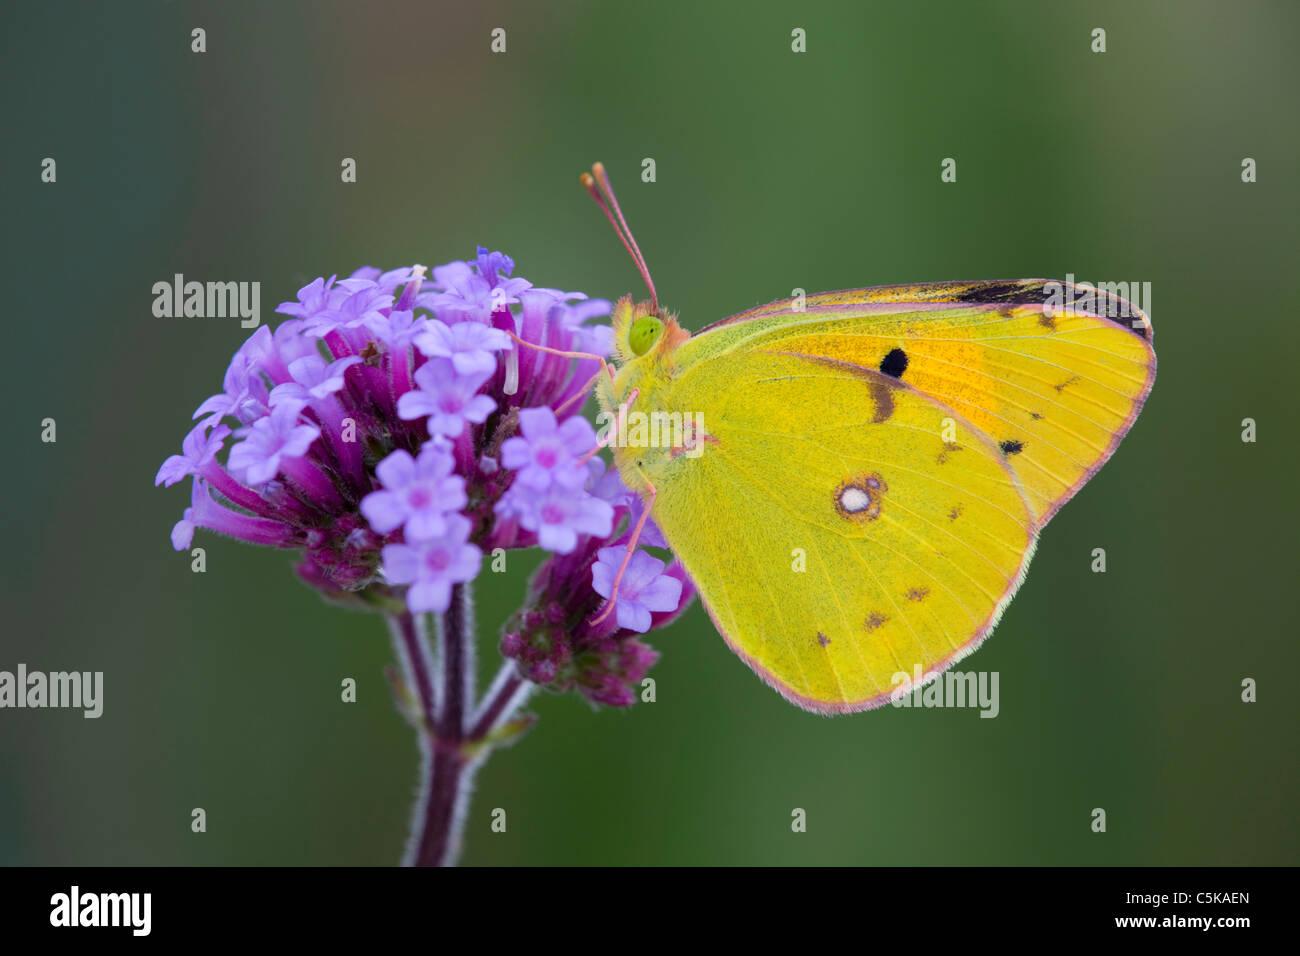 Mariposa amarilla empañados; Colias croceus; verbena flor Imagen De Stock